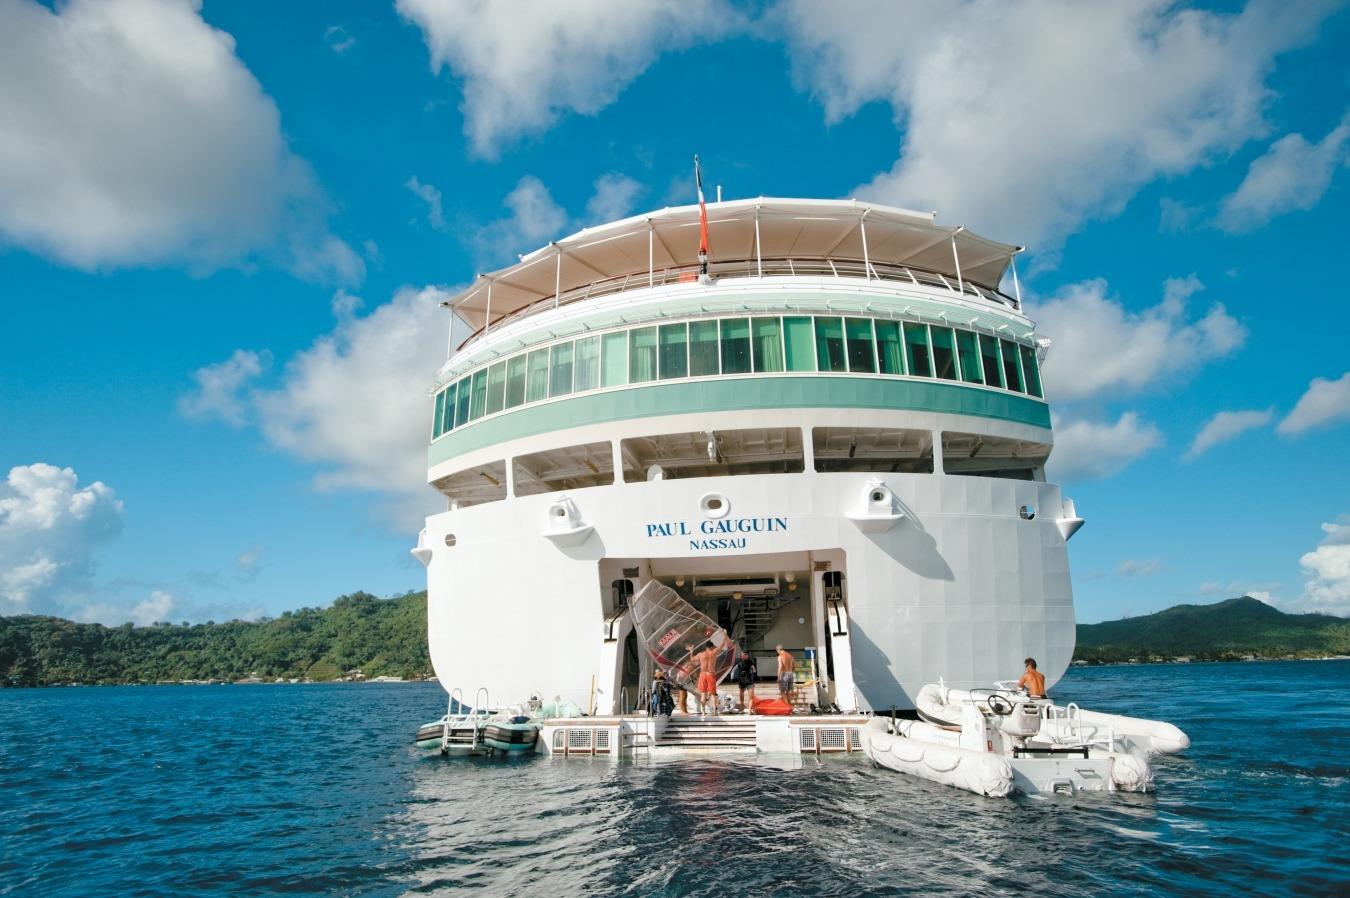 Paul Gauguin Marina Cruise Cruiseschip Watersport